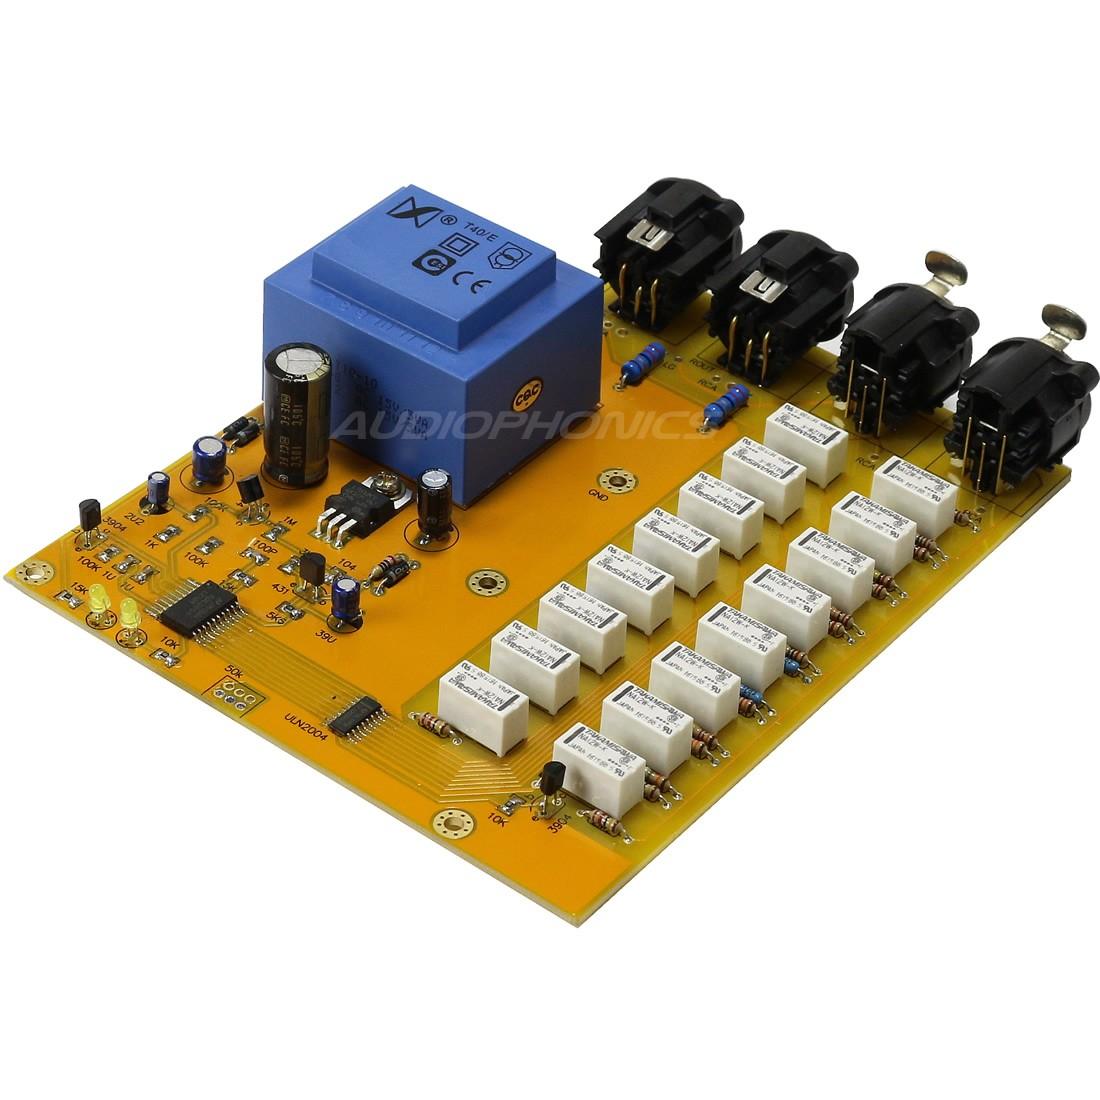 Passive XLR balanced passive Volume control module with 256-level relay